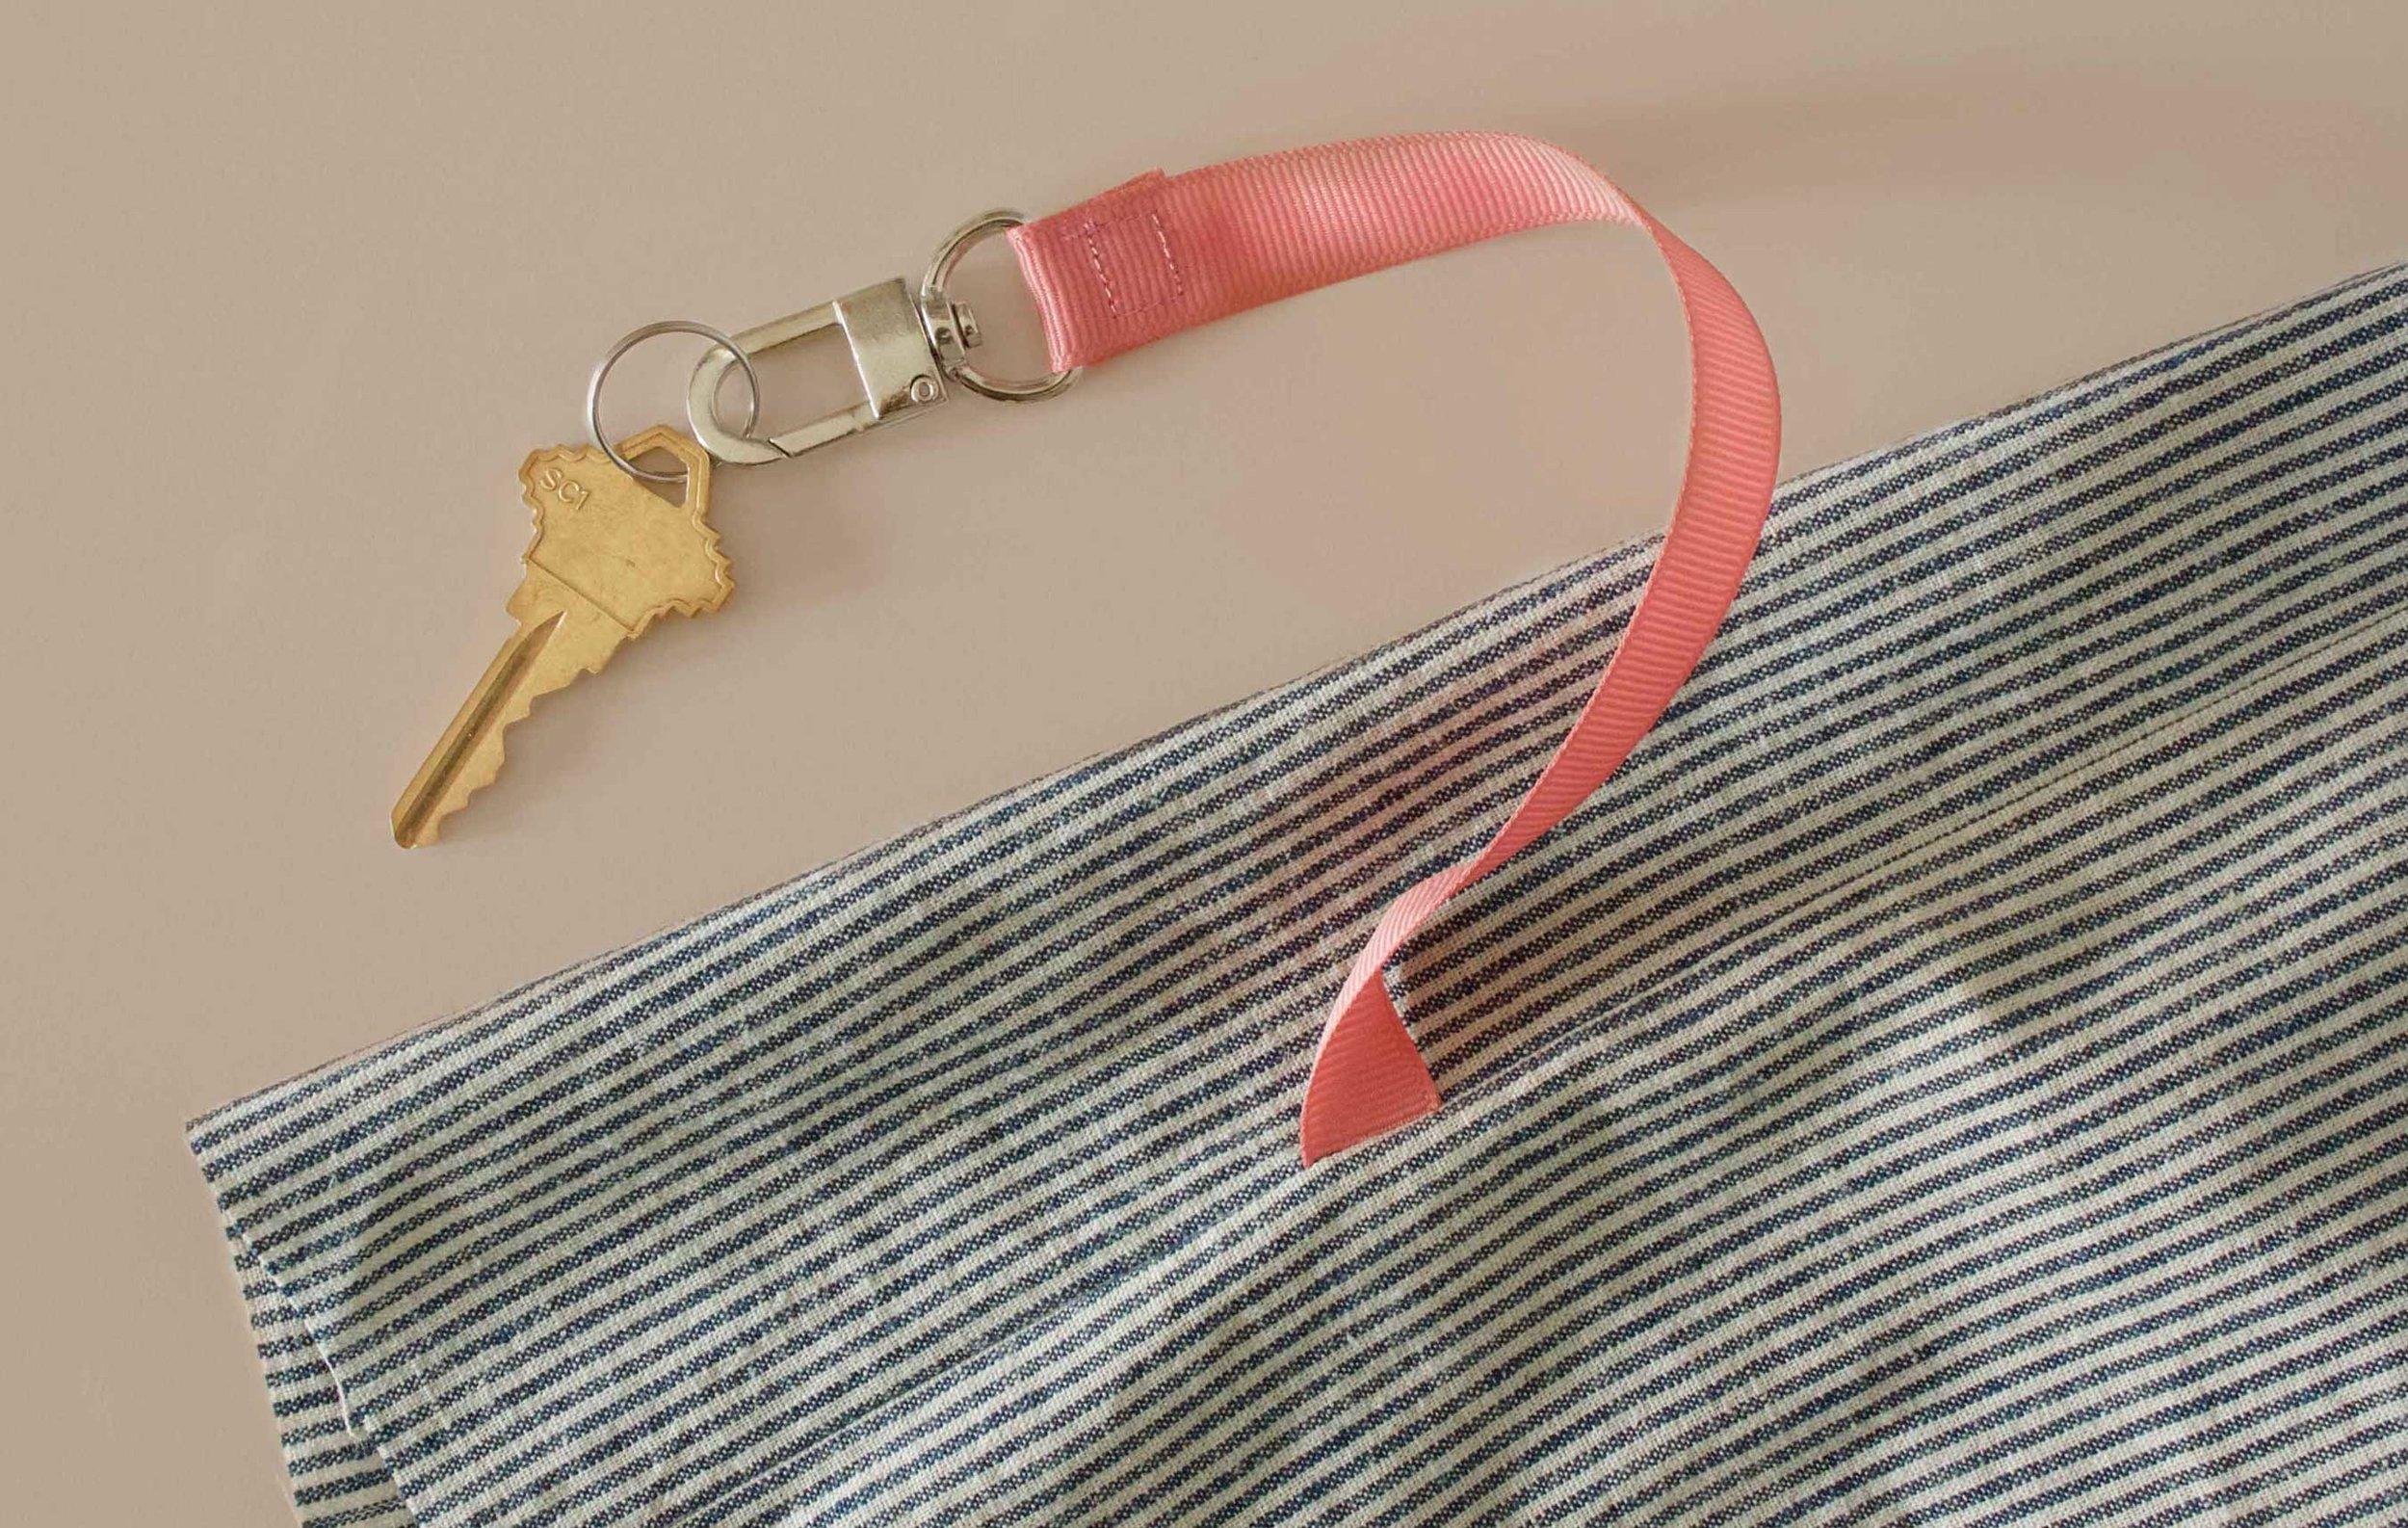 Key leash sewn into side seam of Reversible Tote Bag. Tutorial at threadandwhisk.com